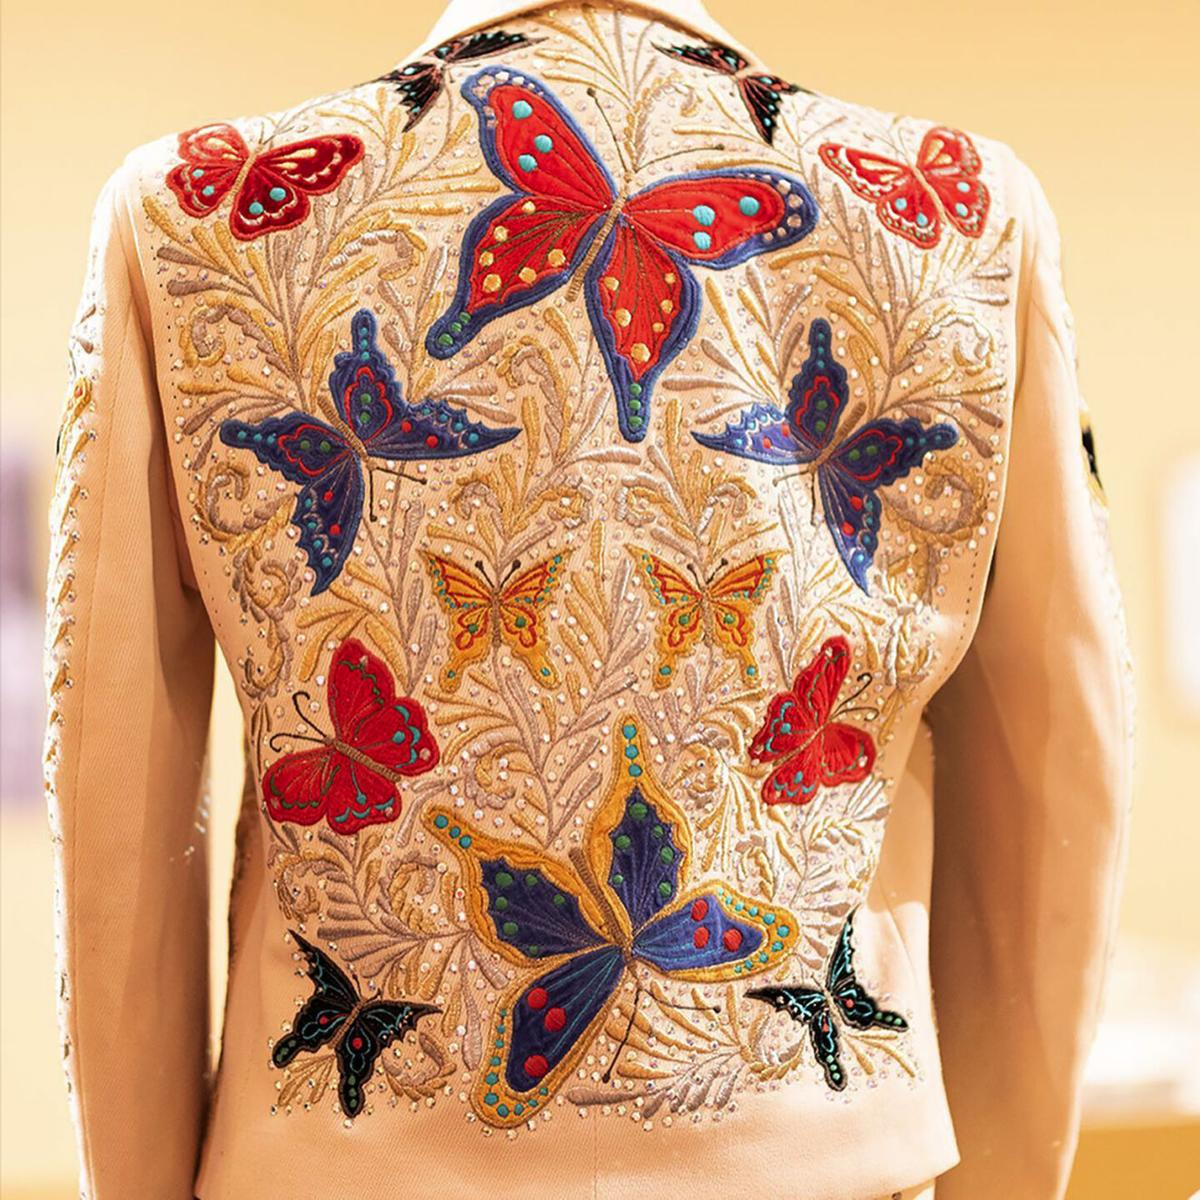 nudie butterfly suit